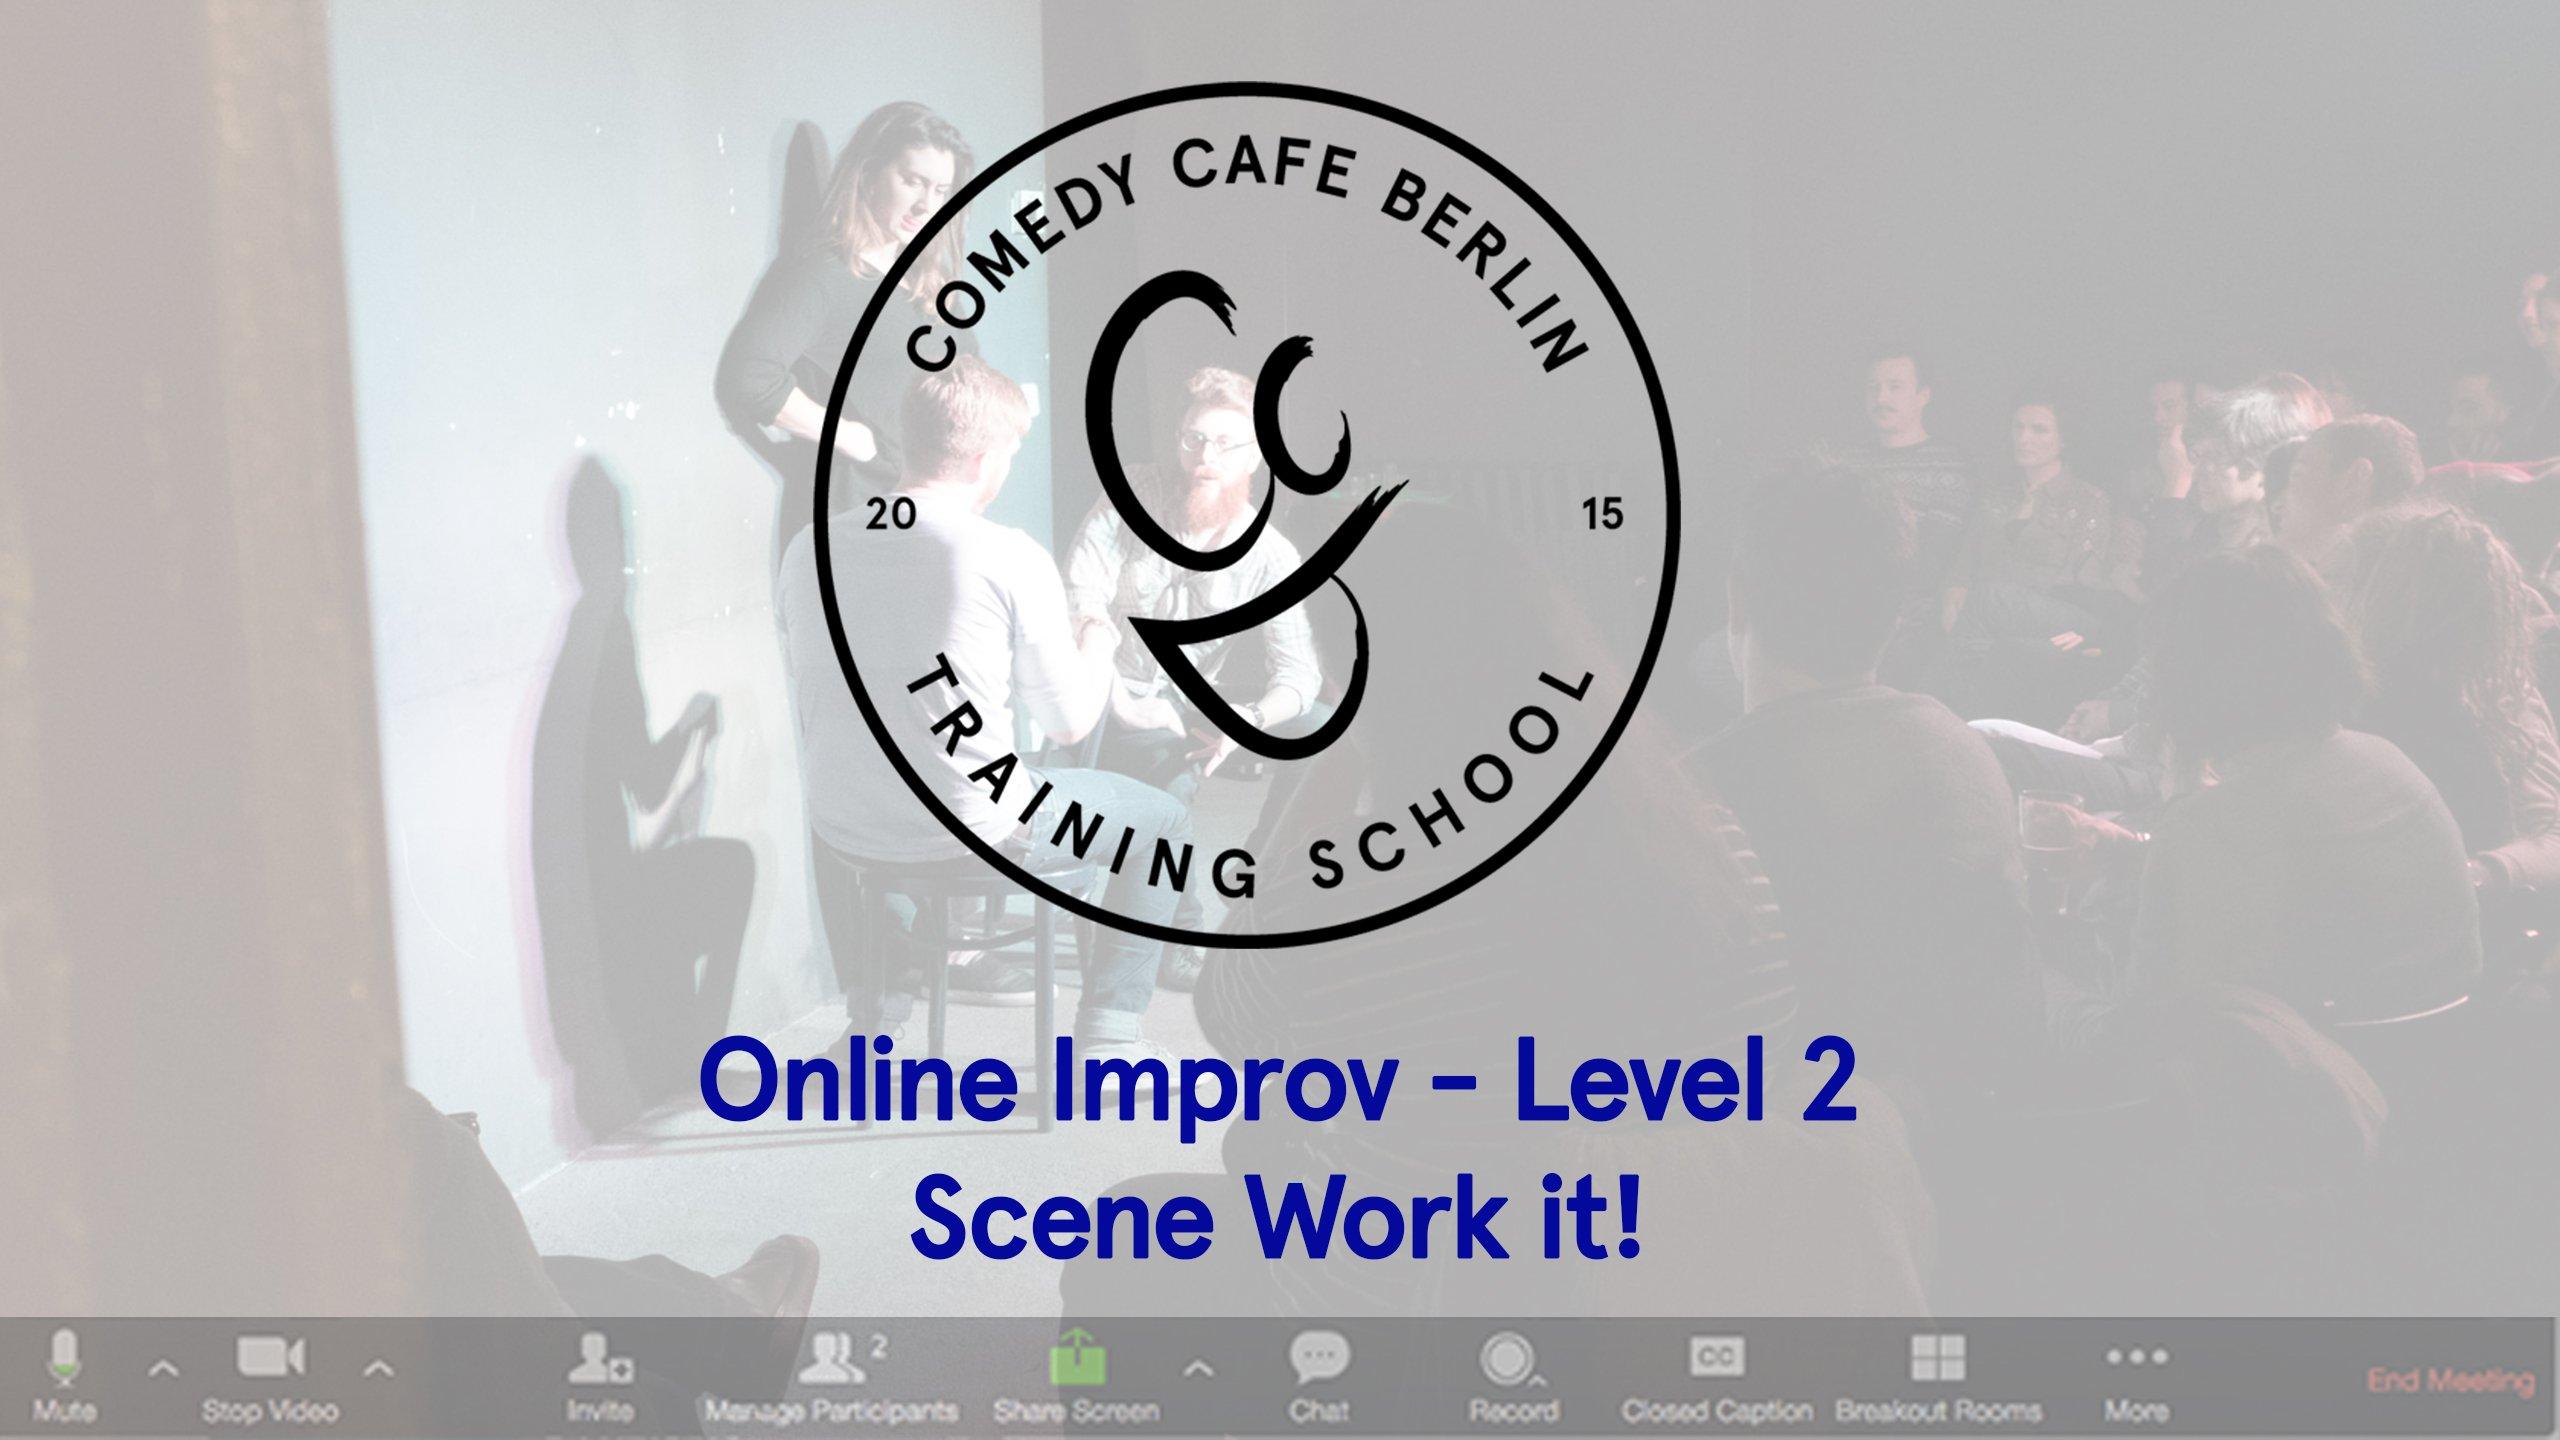 Online Improv Level 2